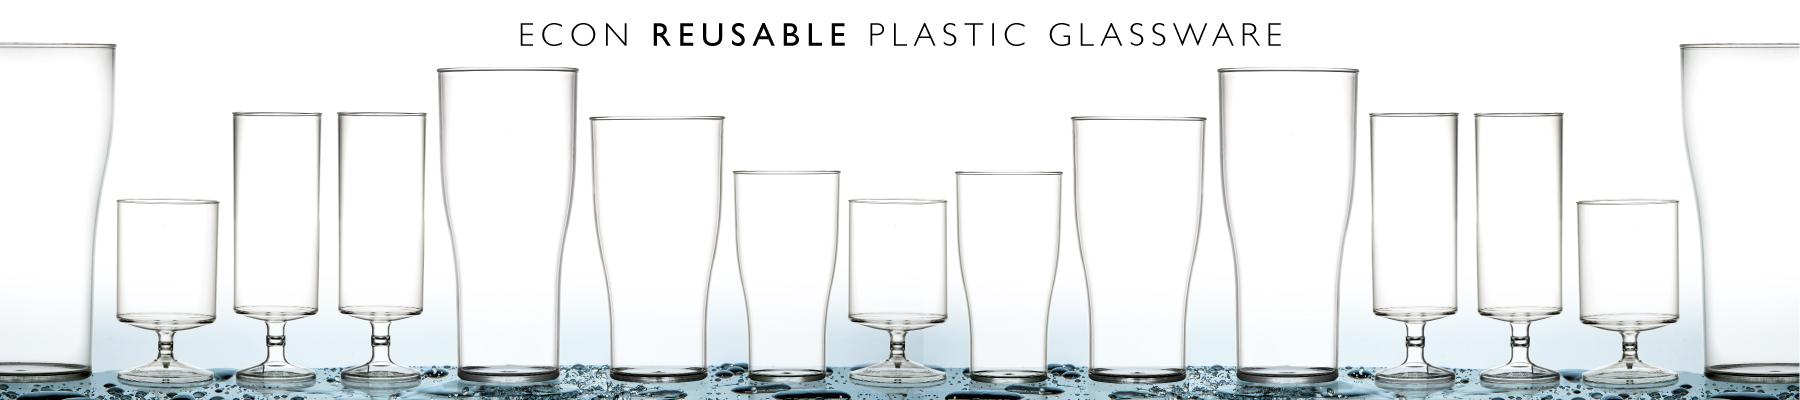 Plastic-Glassware-Supplies-Hampshire